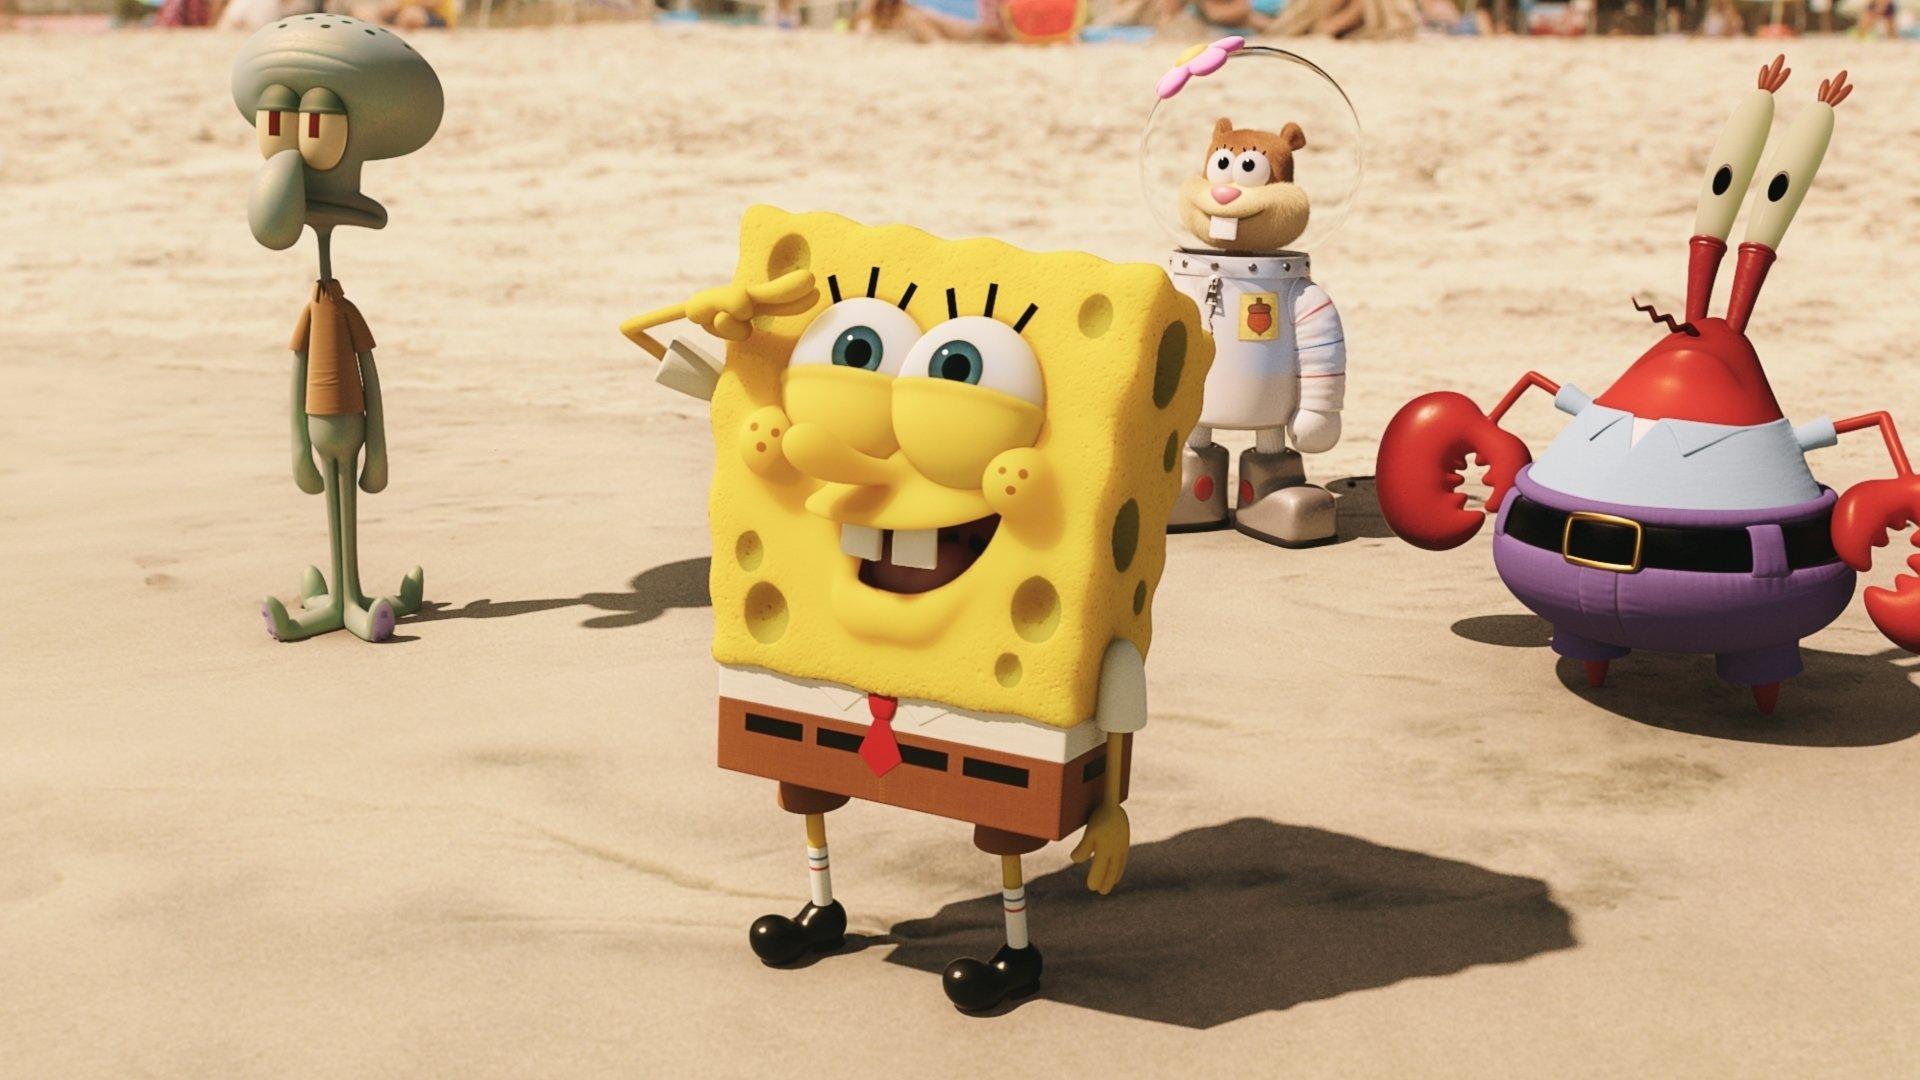 The Spongebob Movie Sponge Out Of Water Hd Wallpaper Background